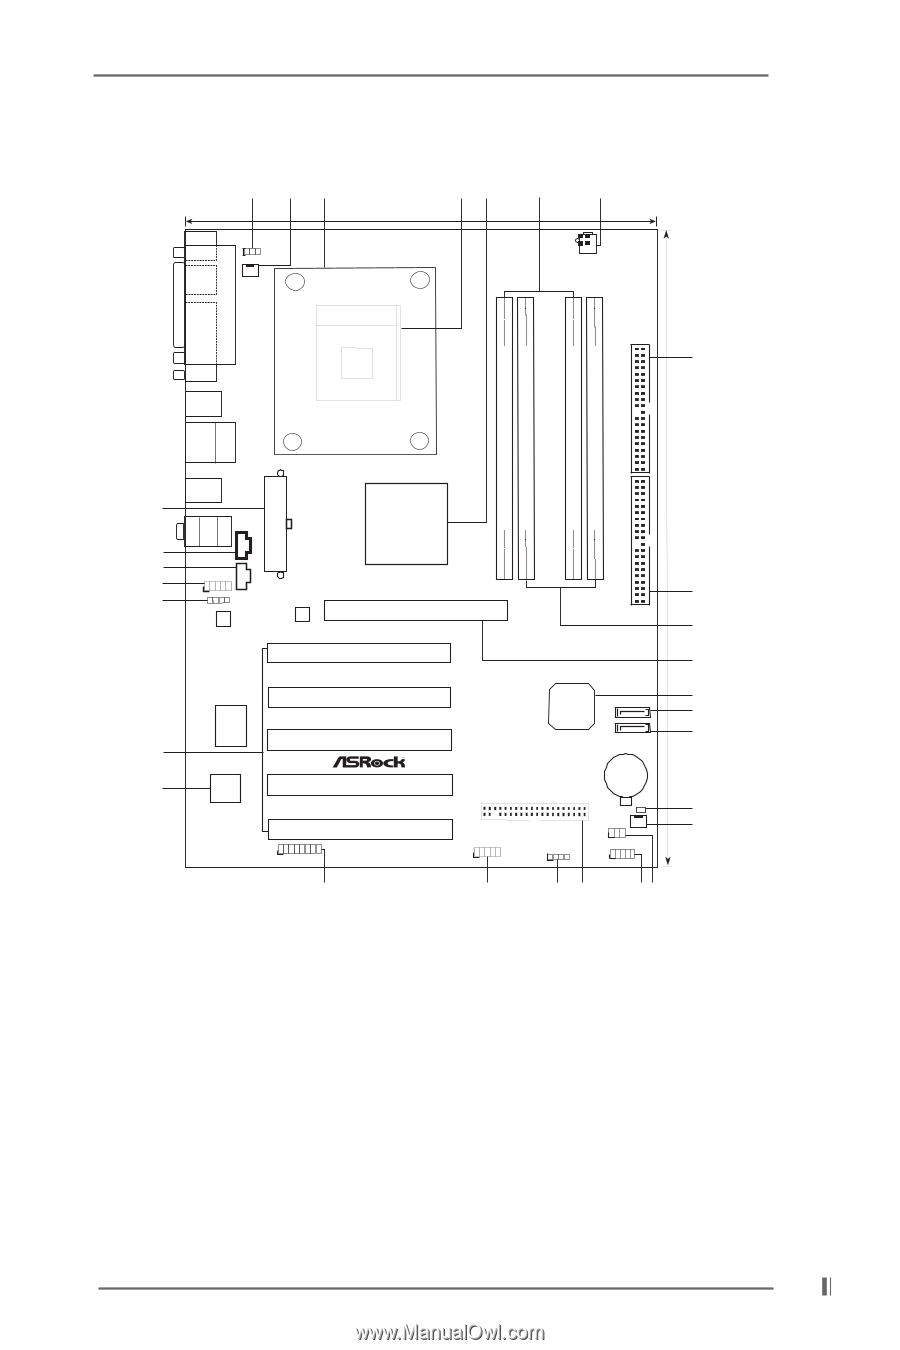 ASROCK P4S55FX 64BIT DRIVER DOWNLOAD